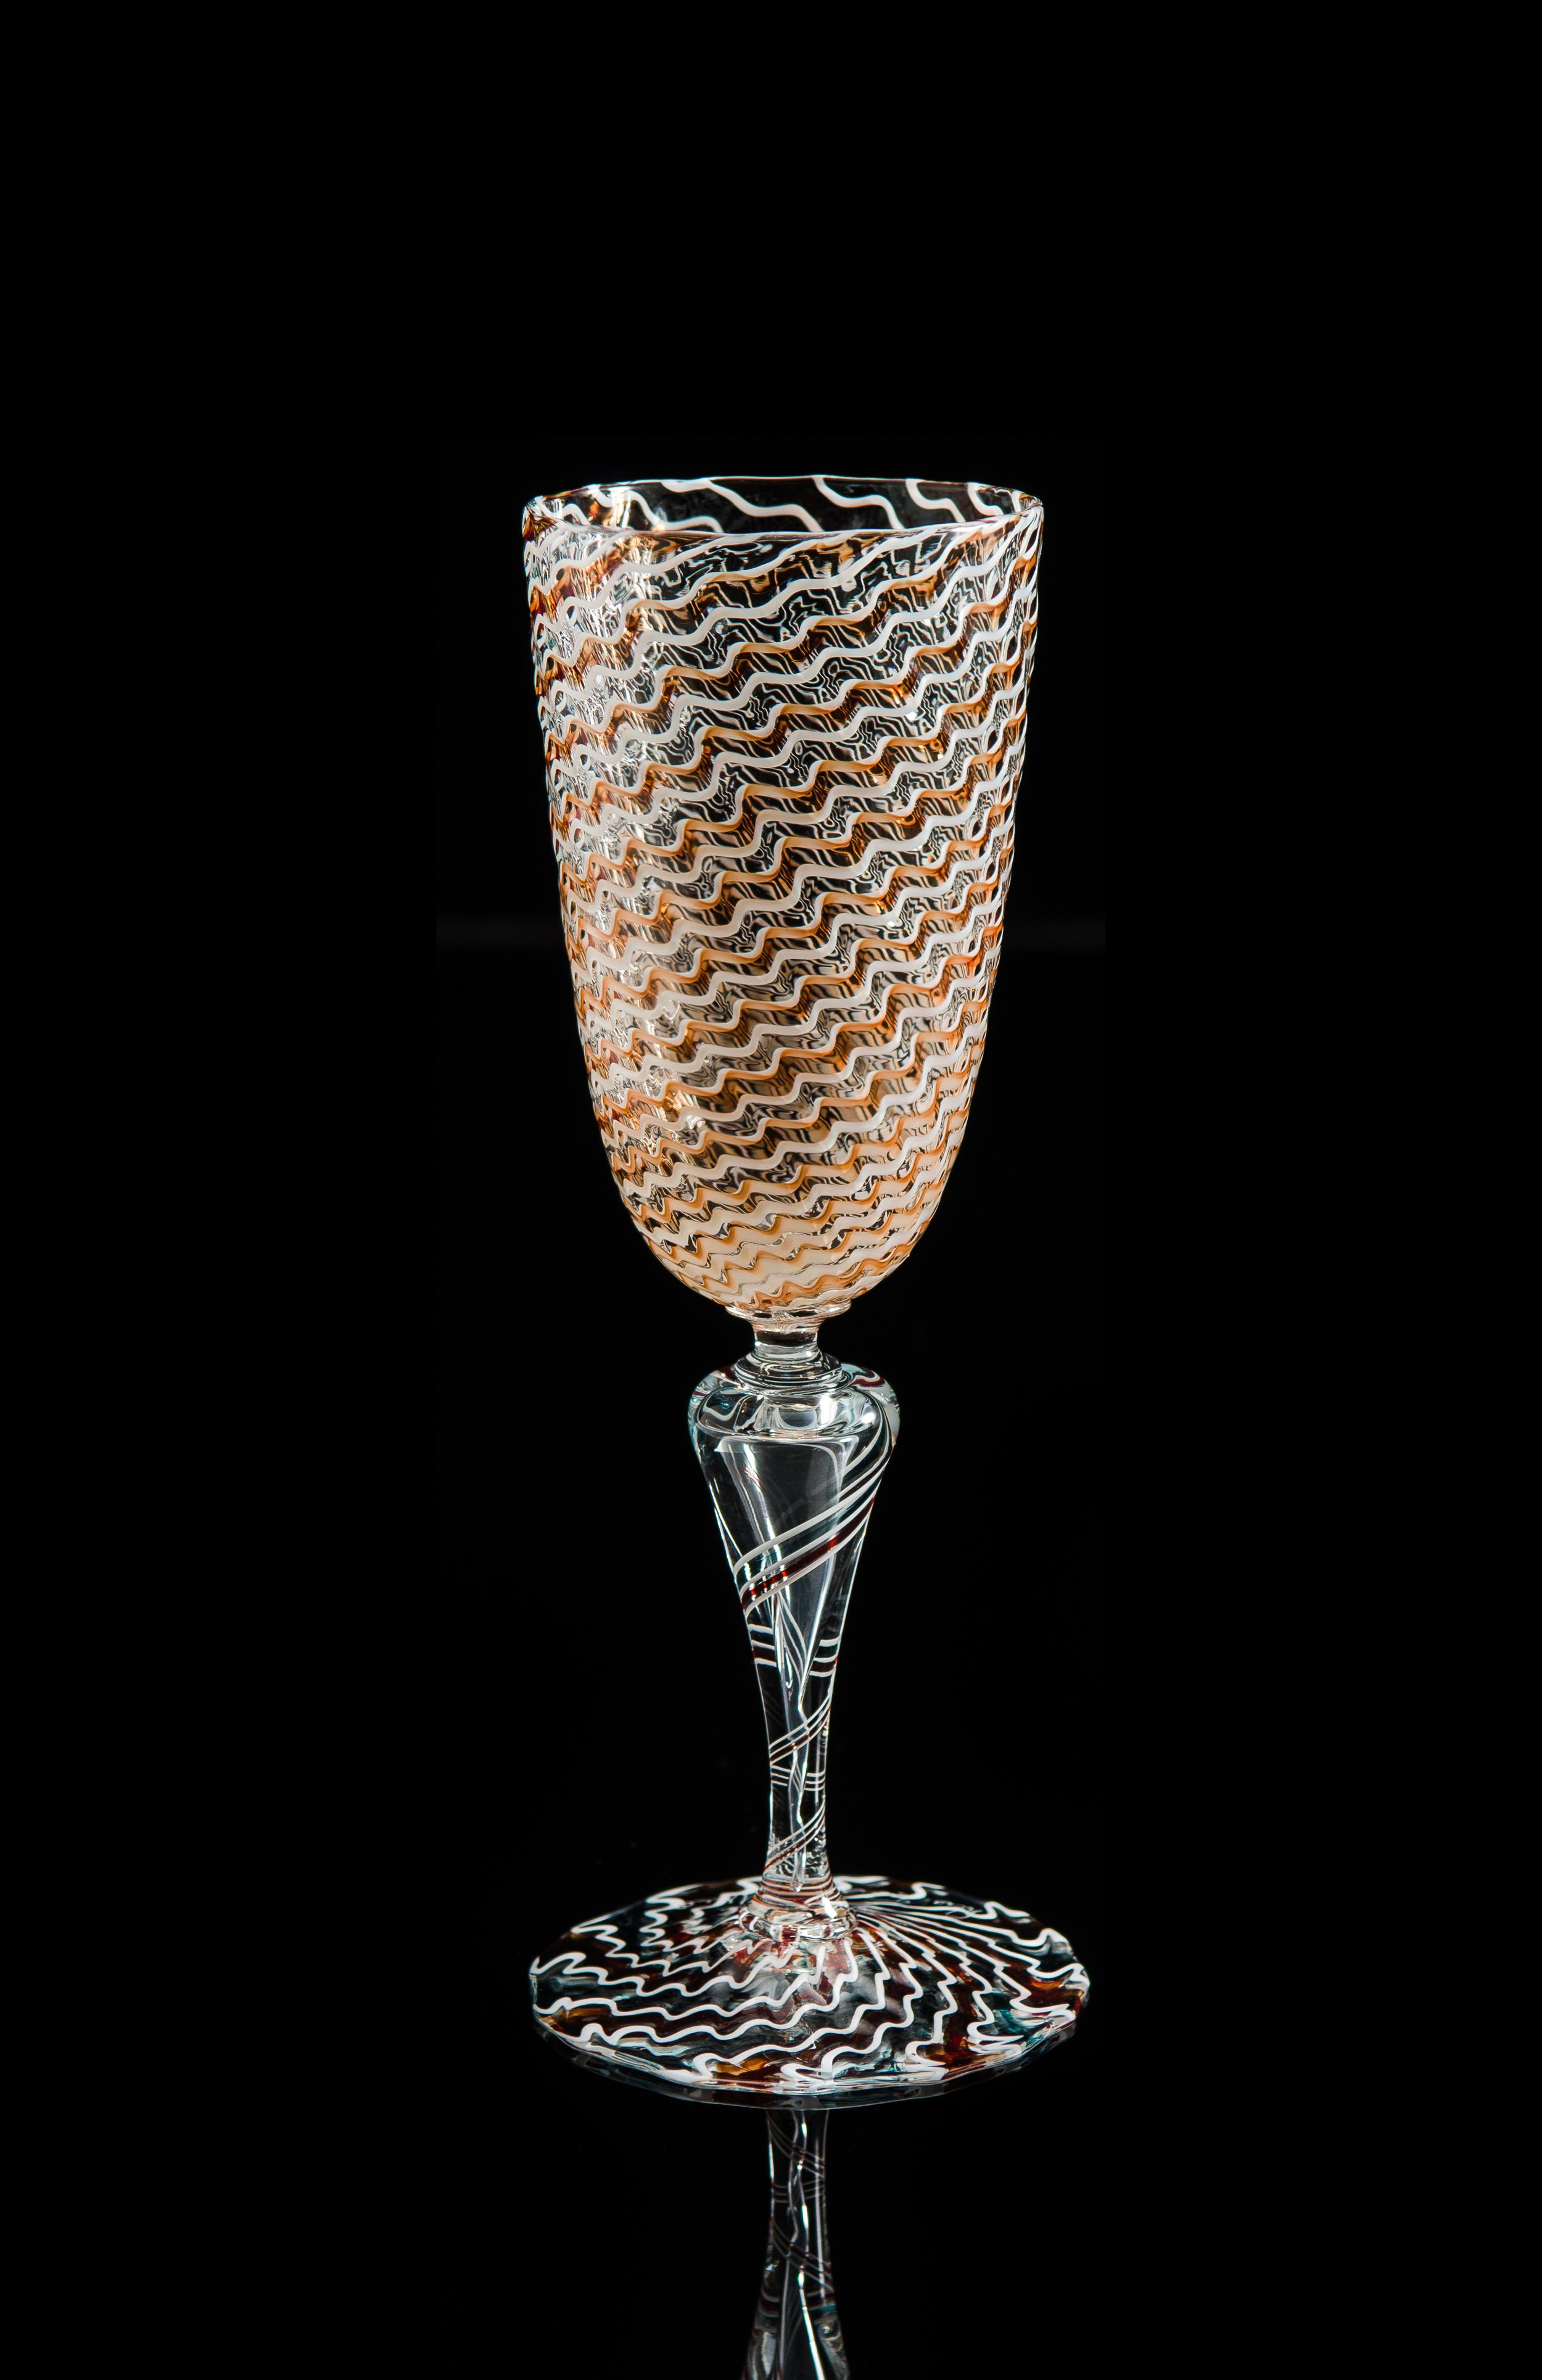 Lino Tagliapietra, Goblet (1991-1994, glass, 8 3/4 x 2 7/8 x 2 7/8 inches), LT.70